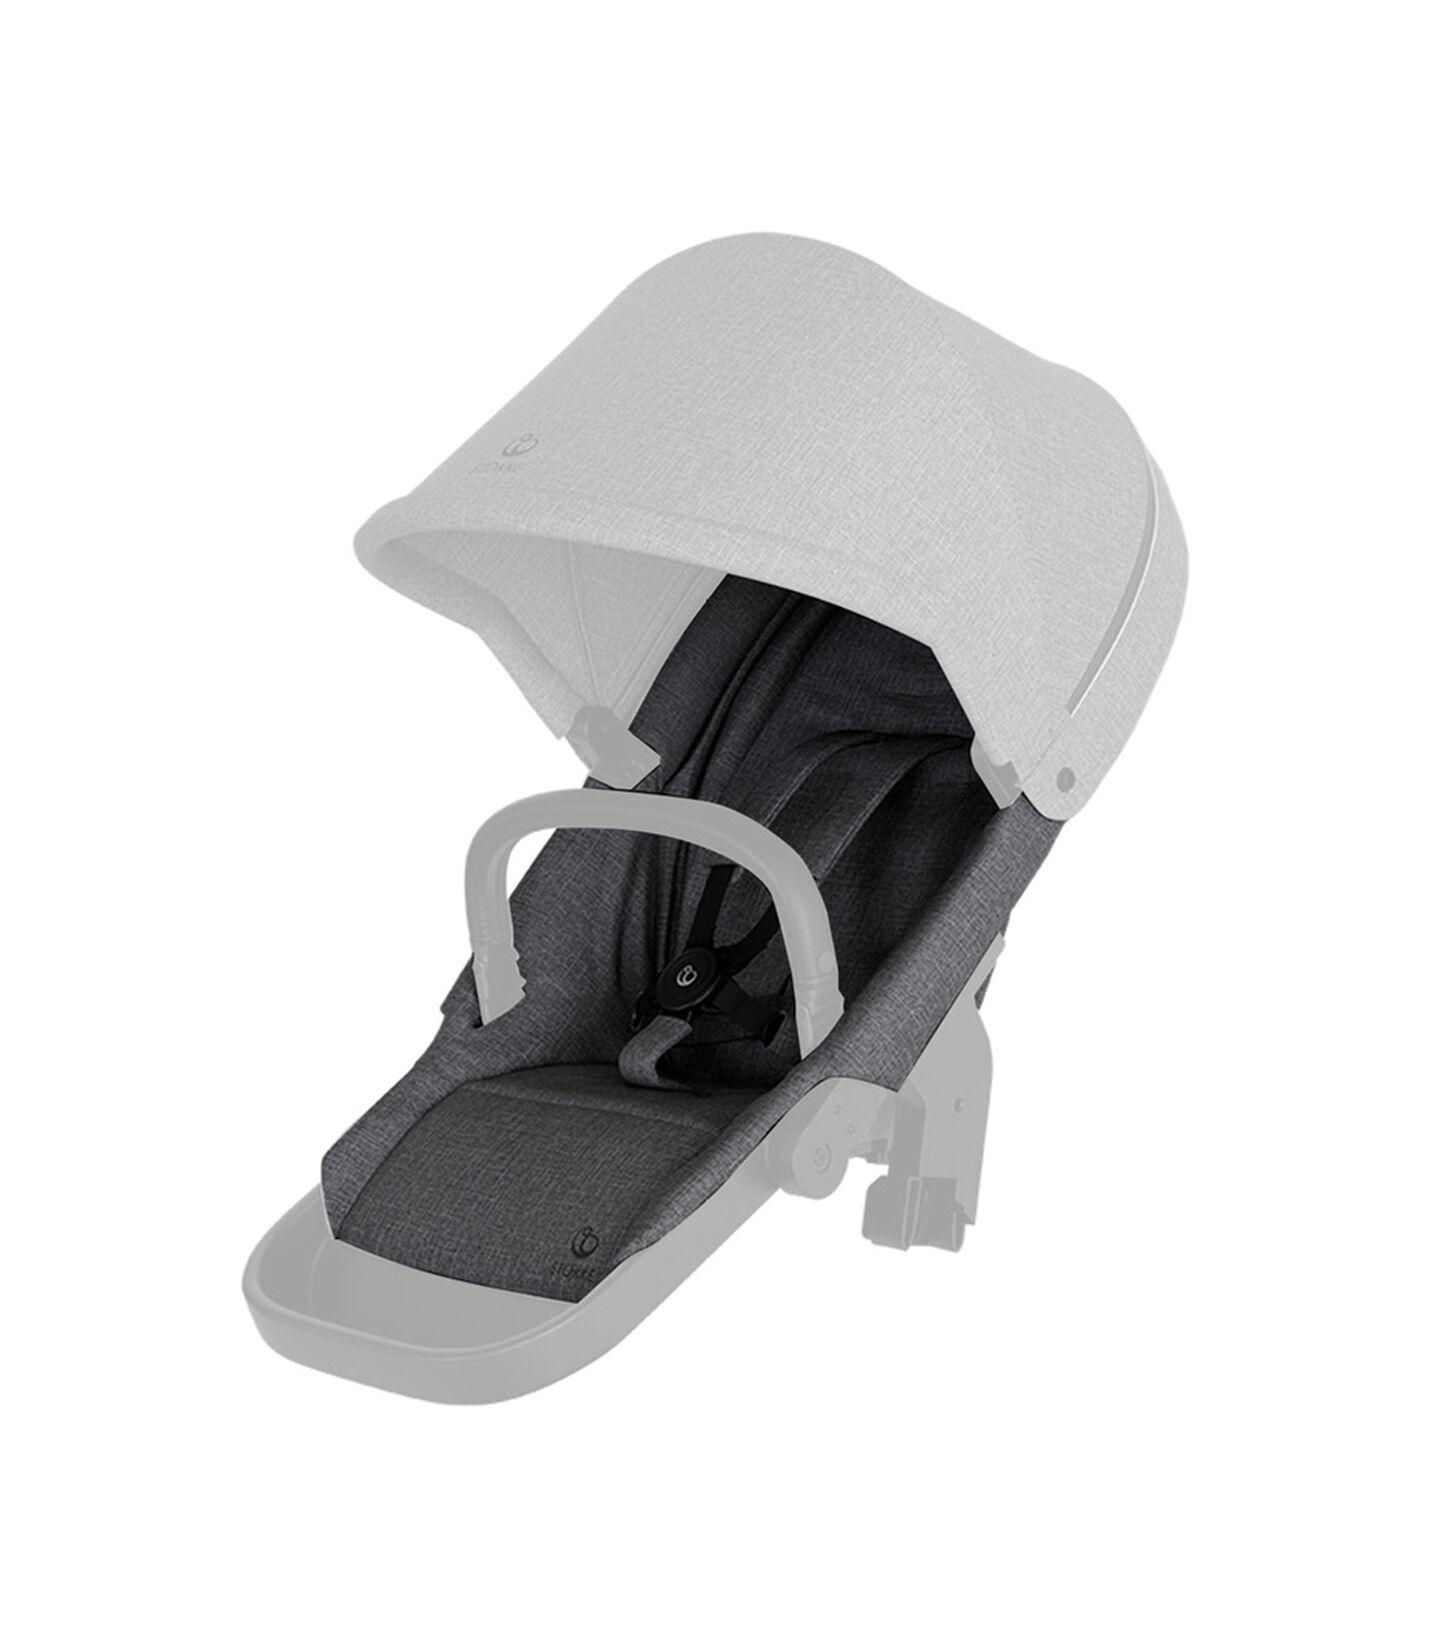 Stokke® Beat seat textile BlackMel wo Can Harness Shpg Baske, Nero Melange, mainview view 1